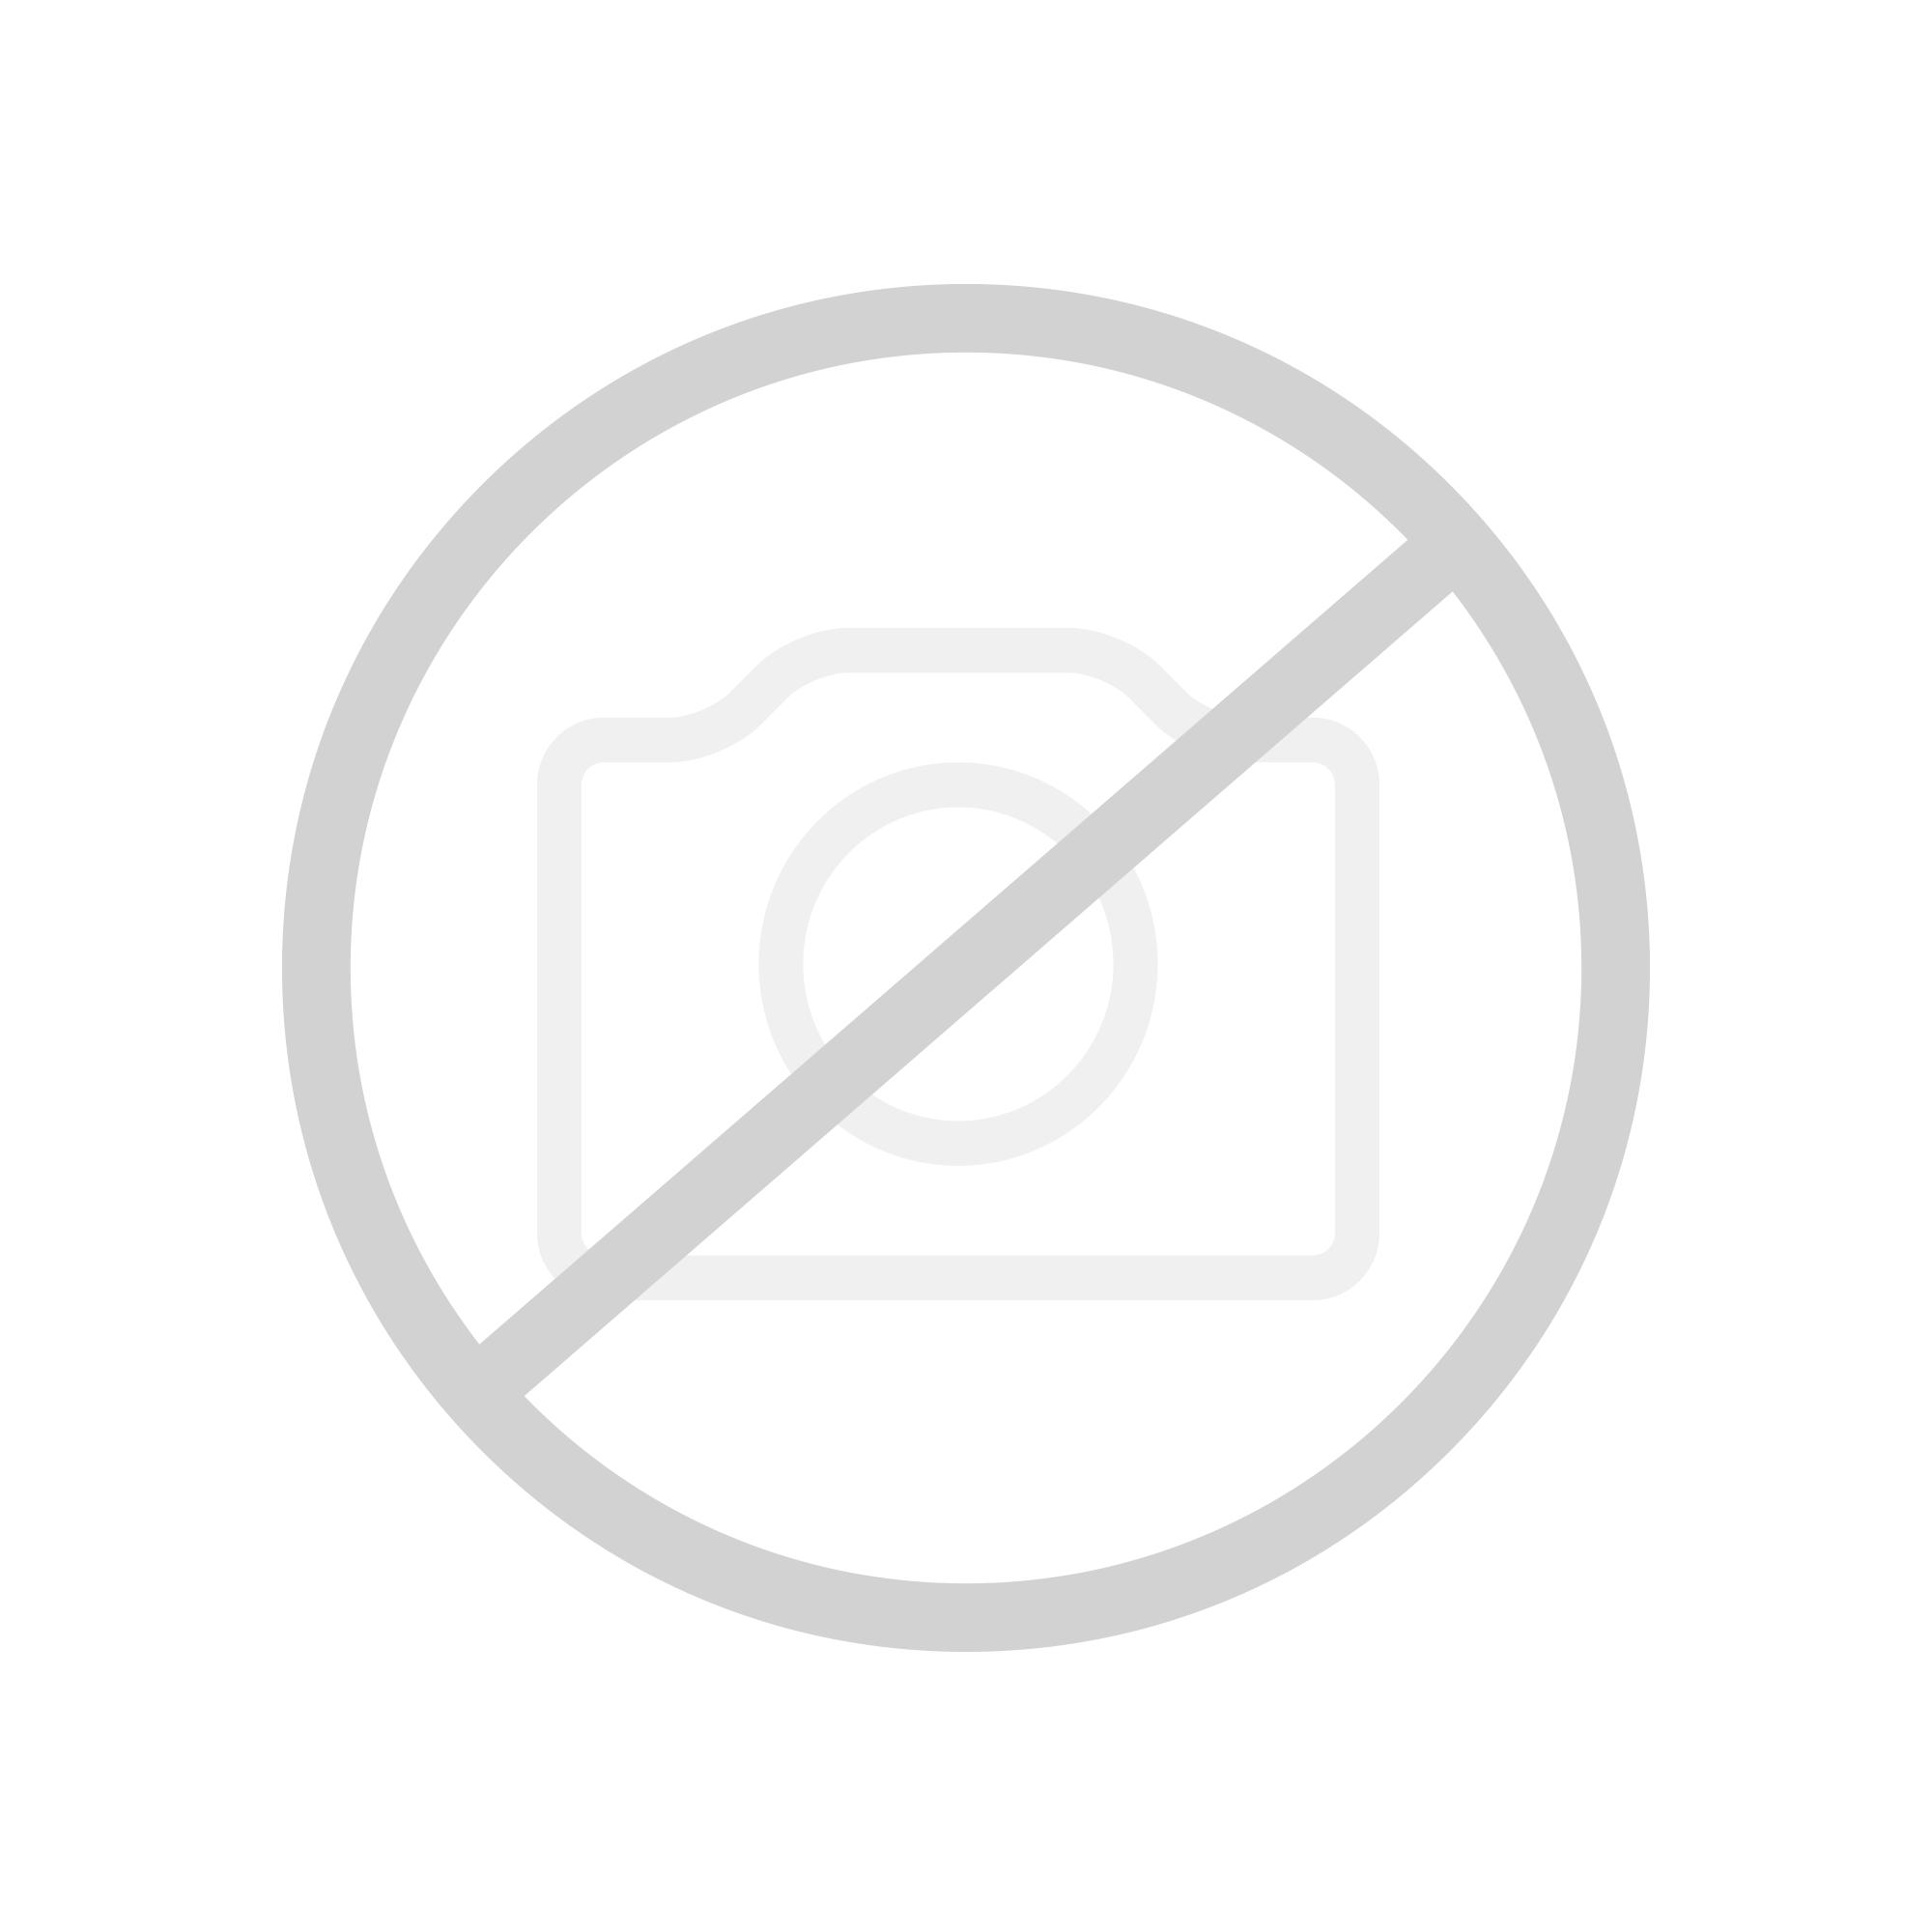 Spülbecken Keramik Franke | kochkor.info | {Spülbecken keramik grau 47}